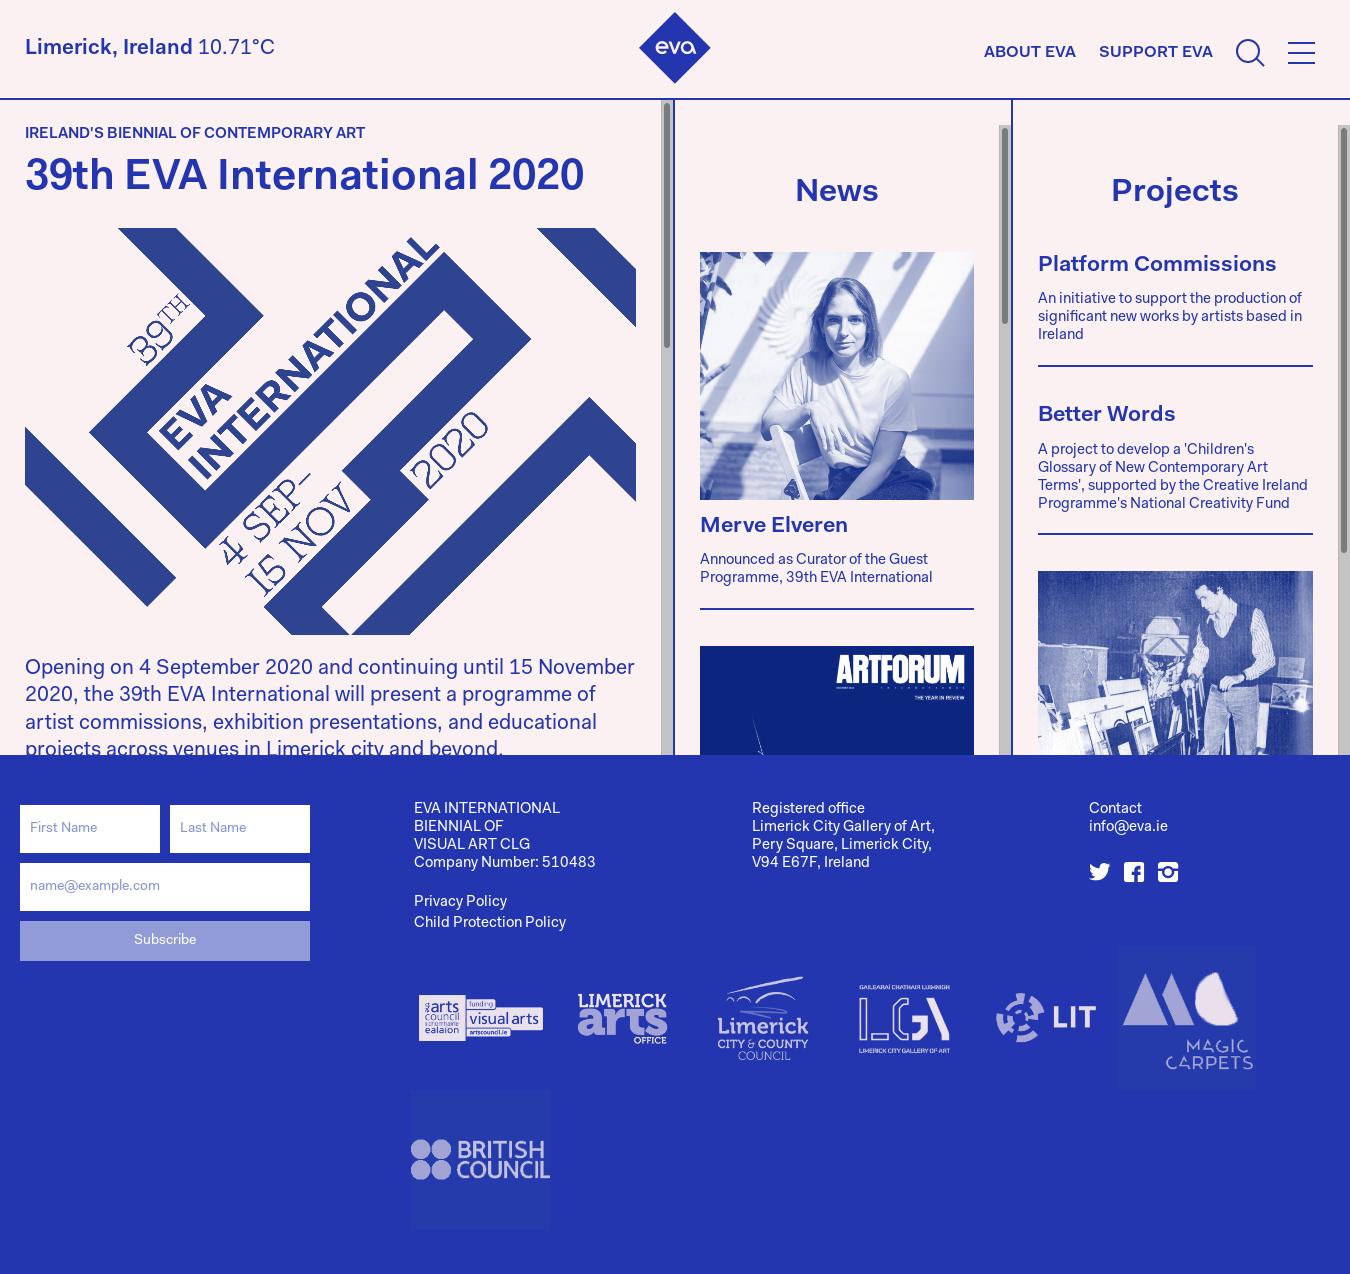 structuration_documents/screenshots-documentation/Screenshot_2019-01-13 Home - EVA International.png